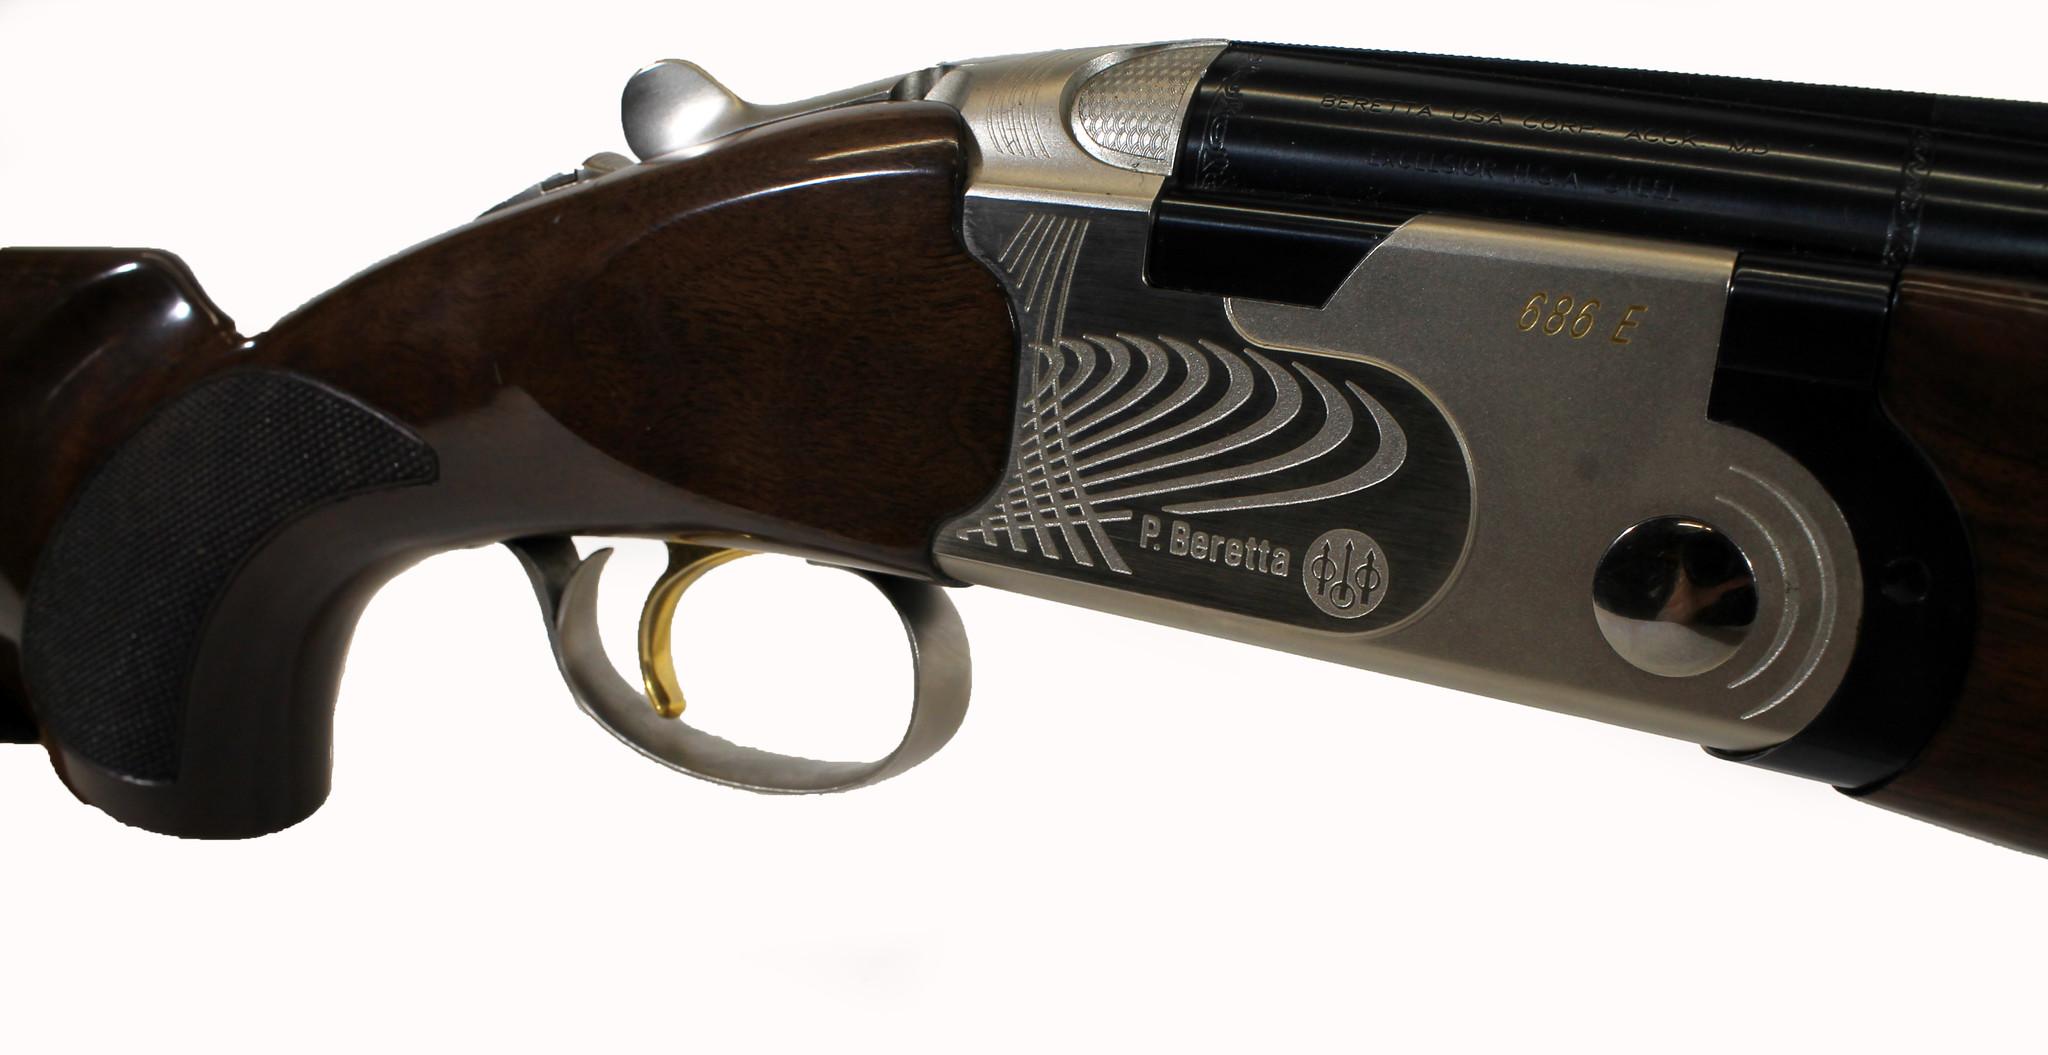 "Beretta UG-12956 USED Beretta 686 E 12 Gauge 3"" 30"" Barrels w/ Choke Tubes and Original Case"